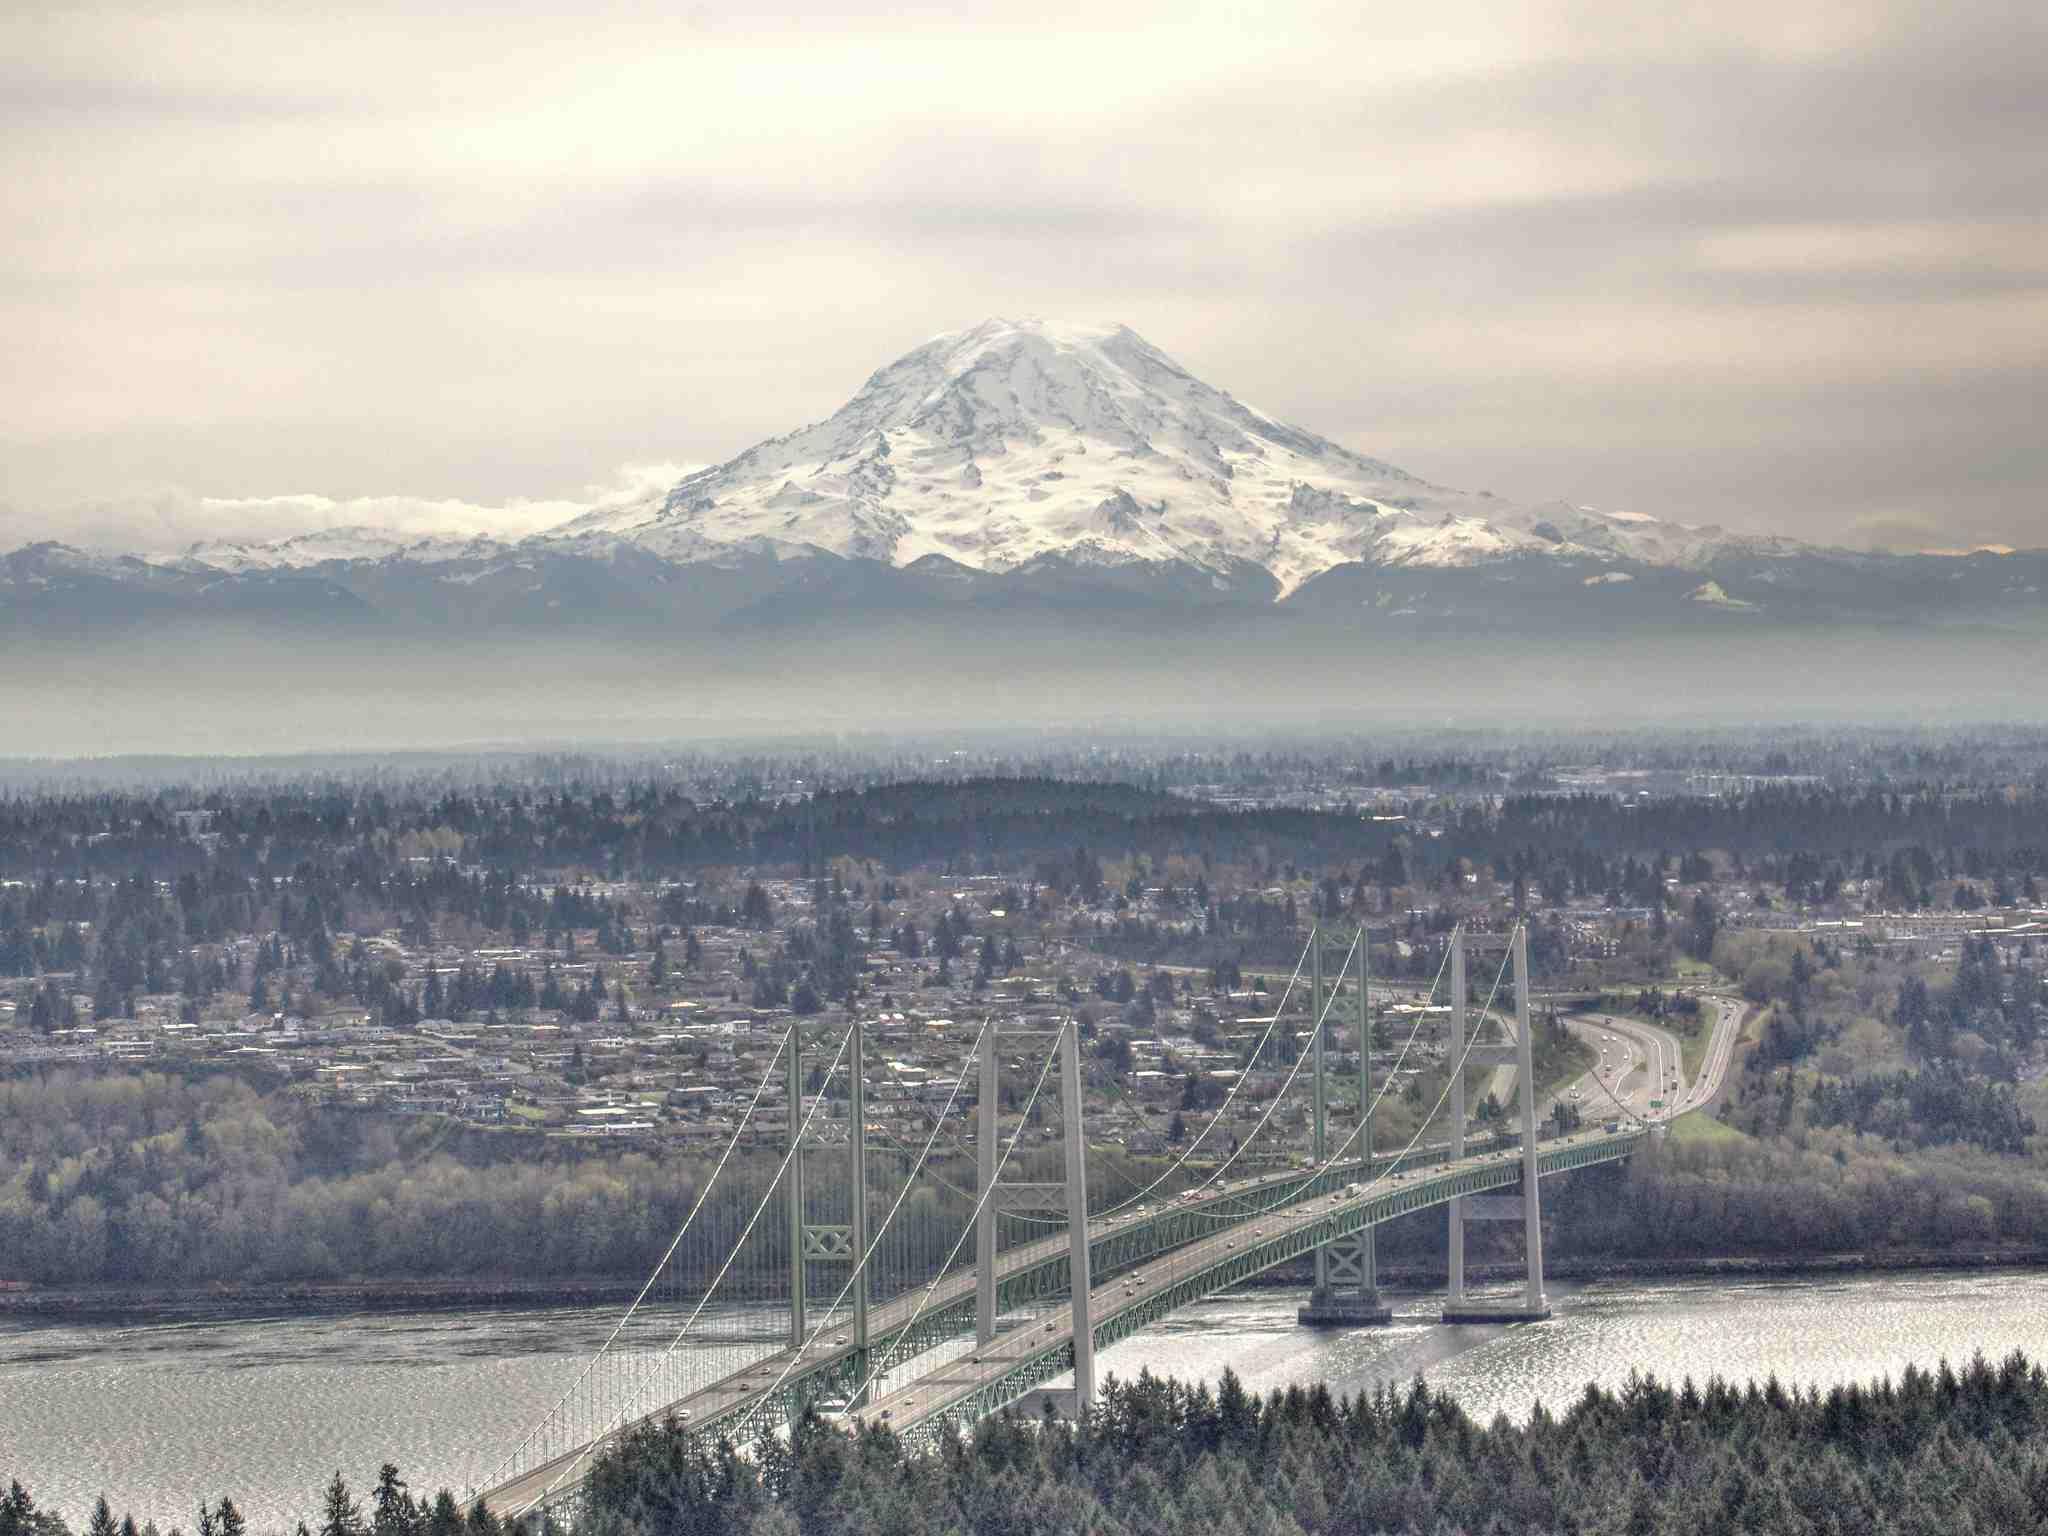 Tacoma Narrows Bridge and Mount Rainier